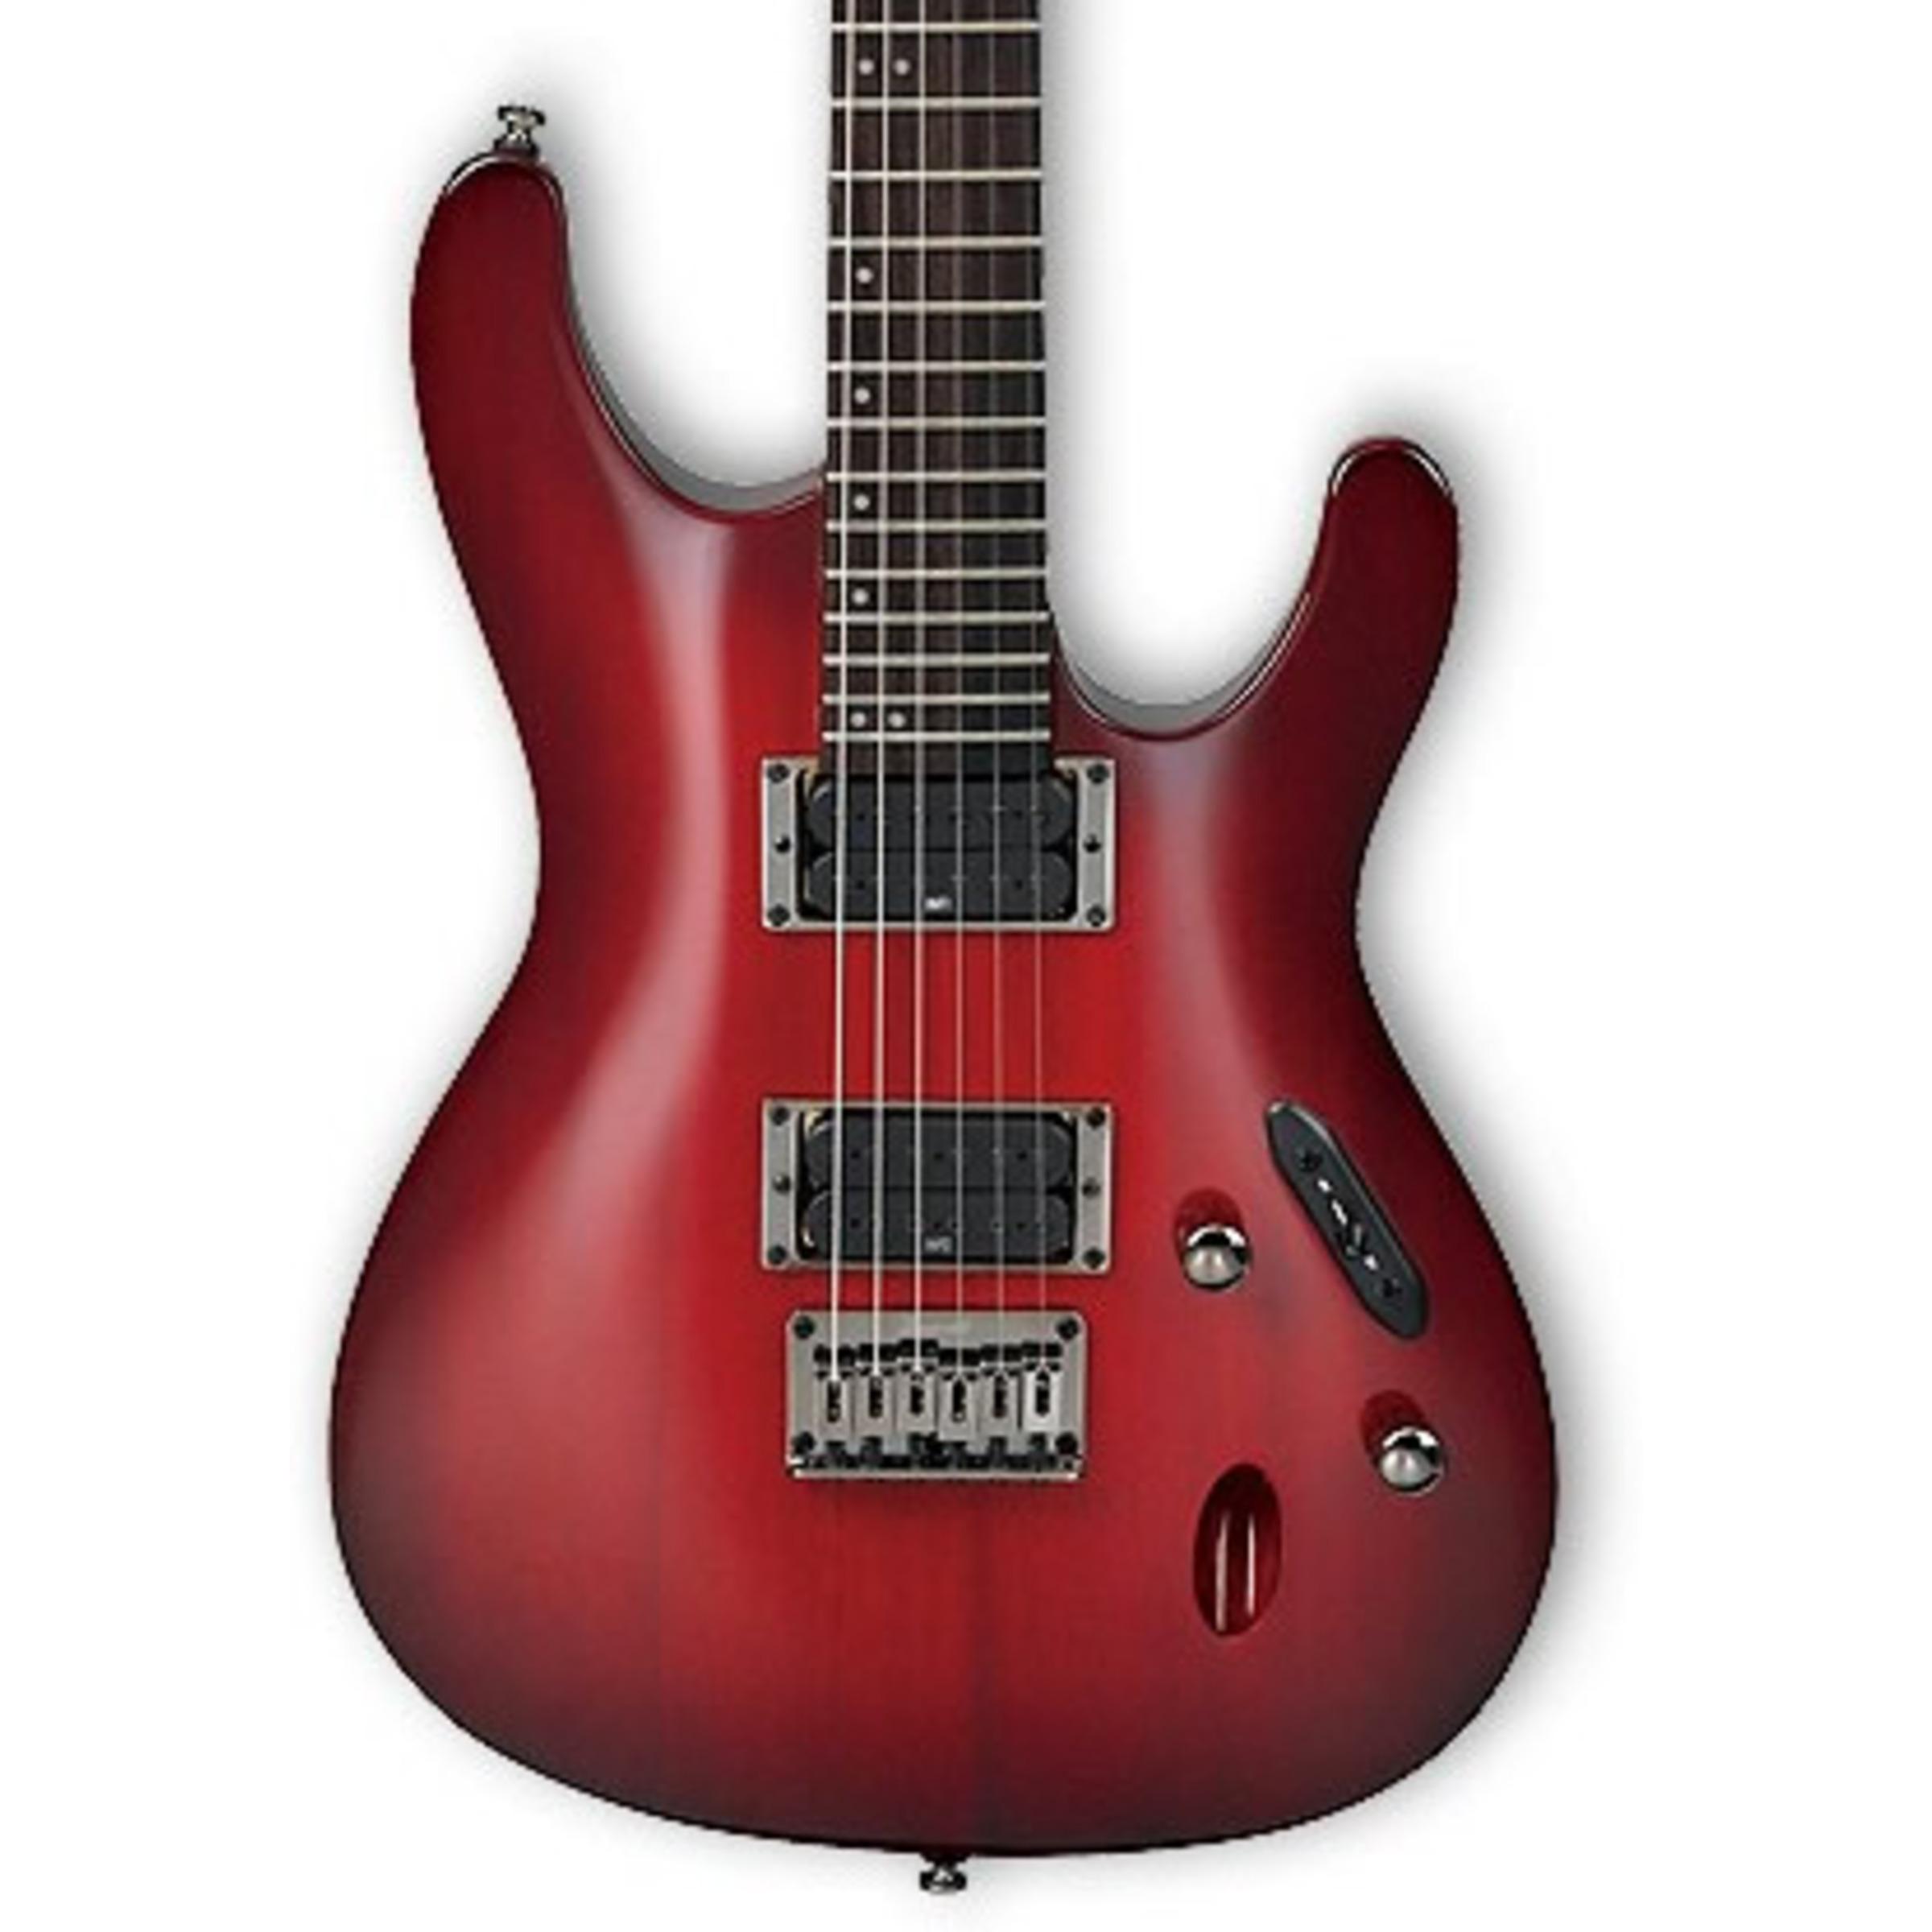 ibanez s521 electric guitar giggear. Black Bedroom Furniture Sets. Home Design Ideas